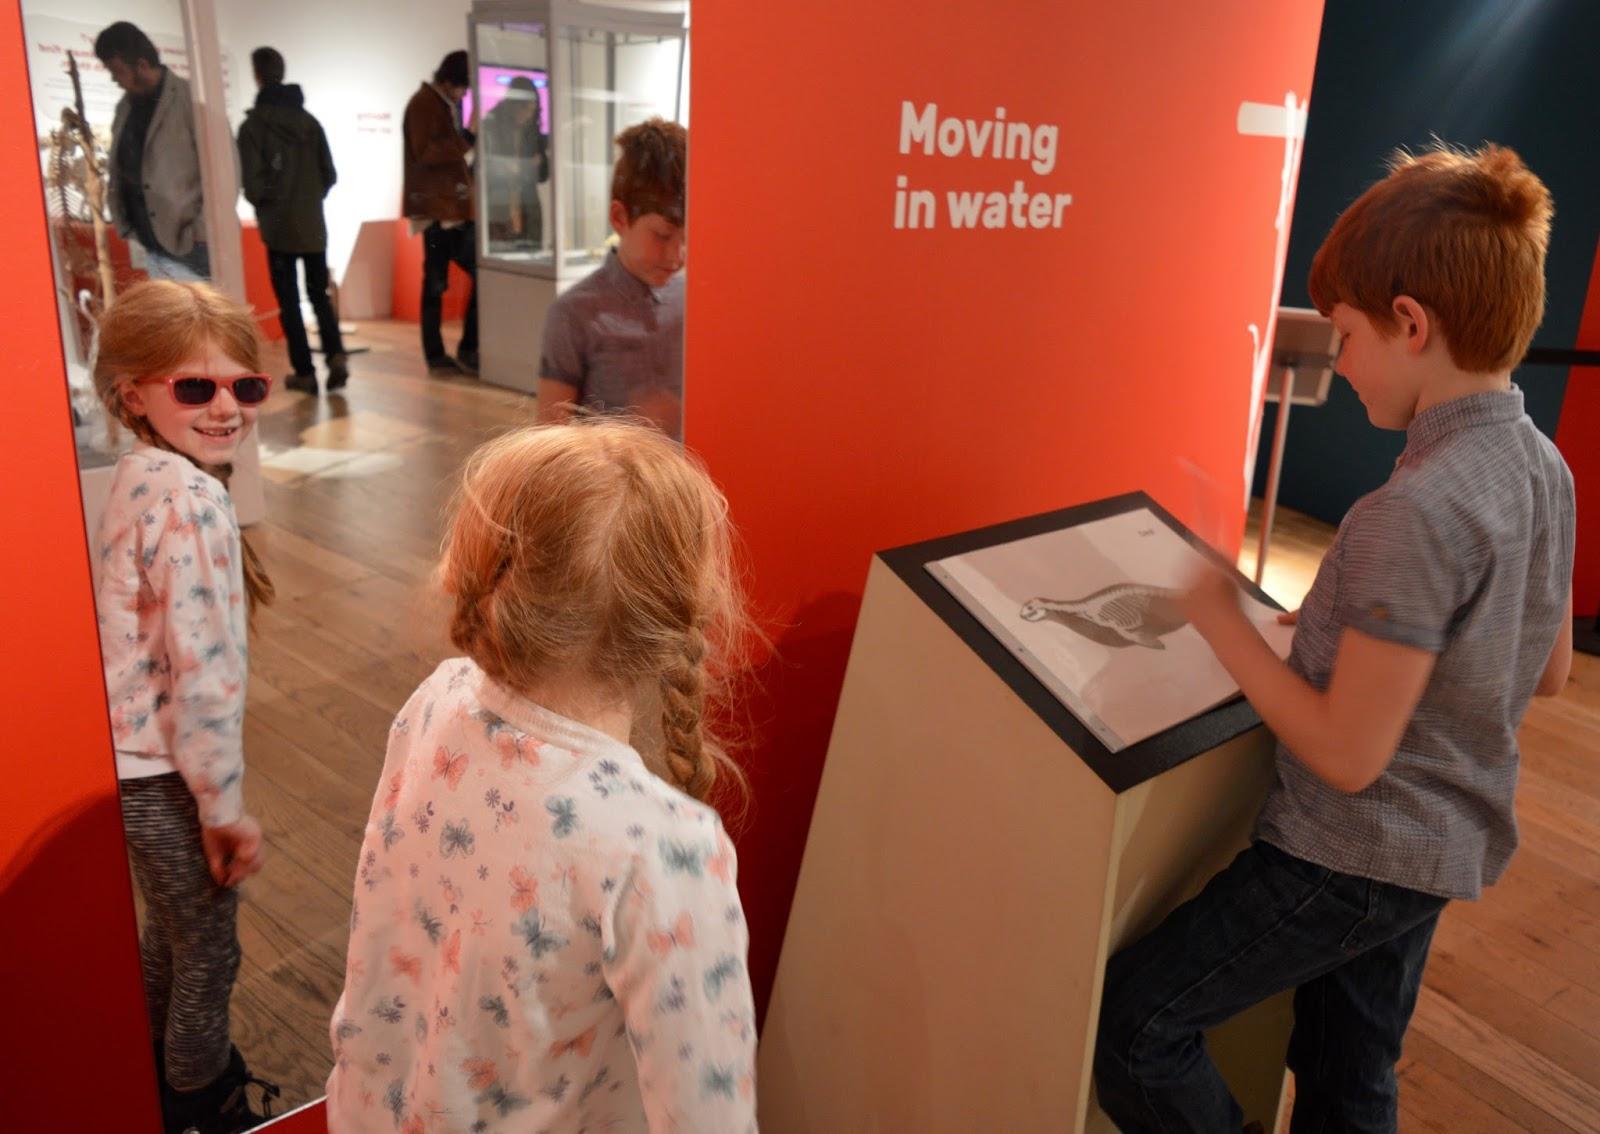 Bones Exhibition at Hancock Museum, Newcastle - spine moving in mirror